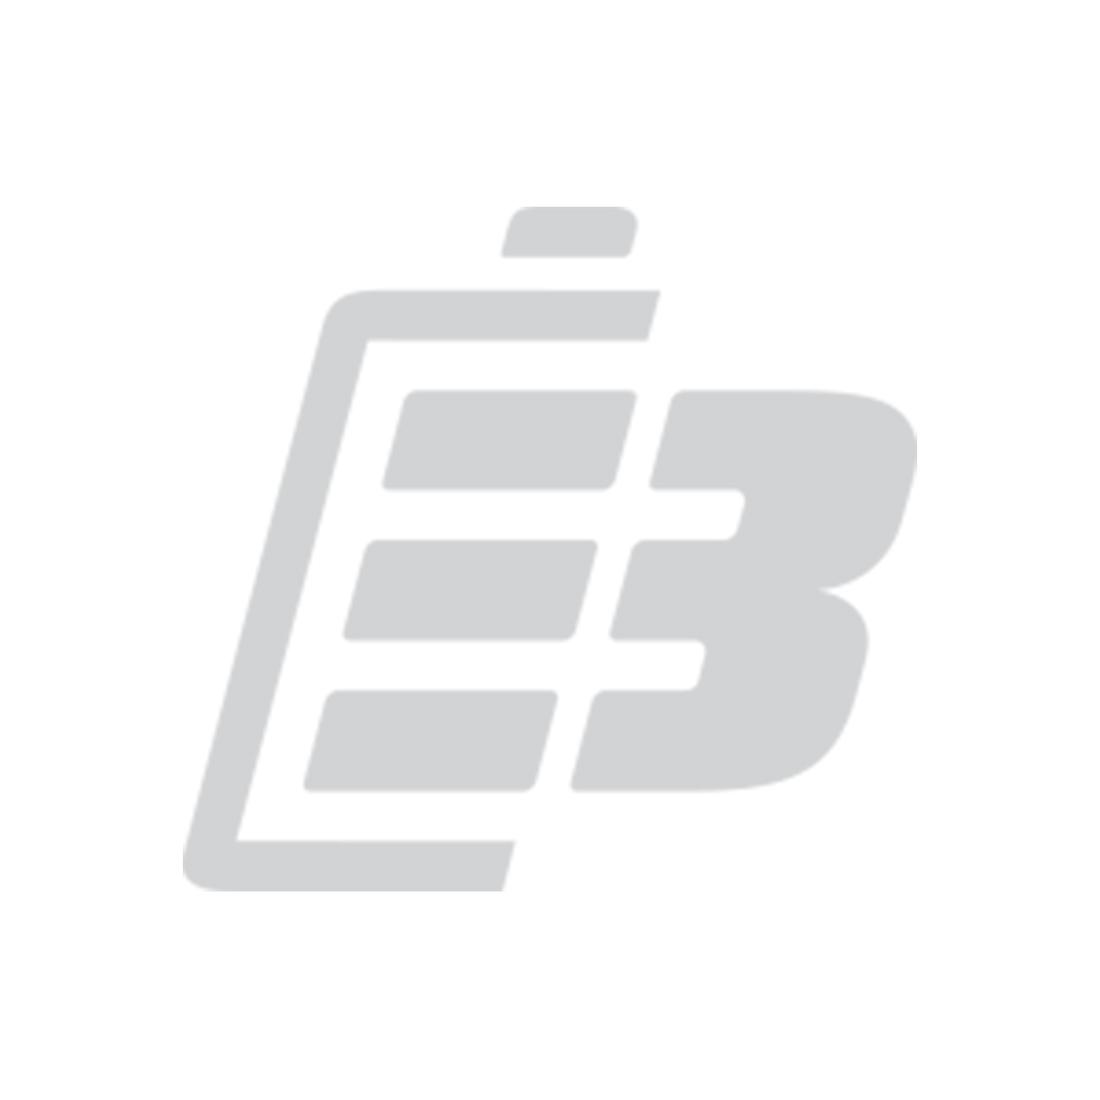 Cordless phone battery Avaya 3626_1